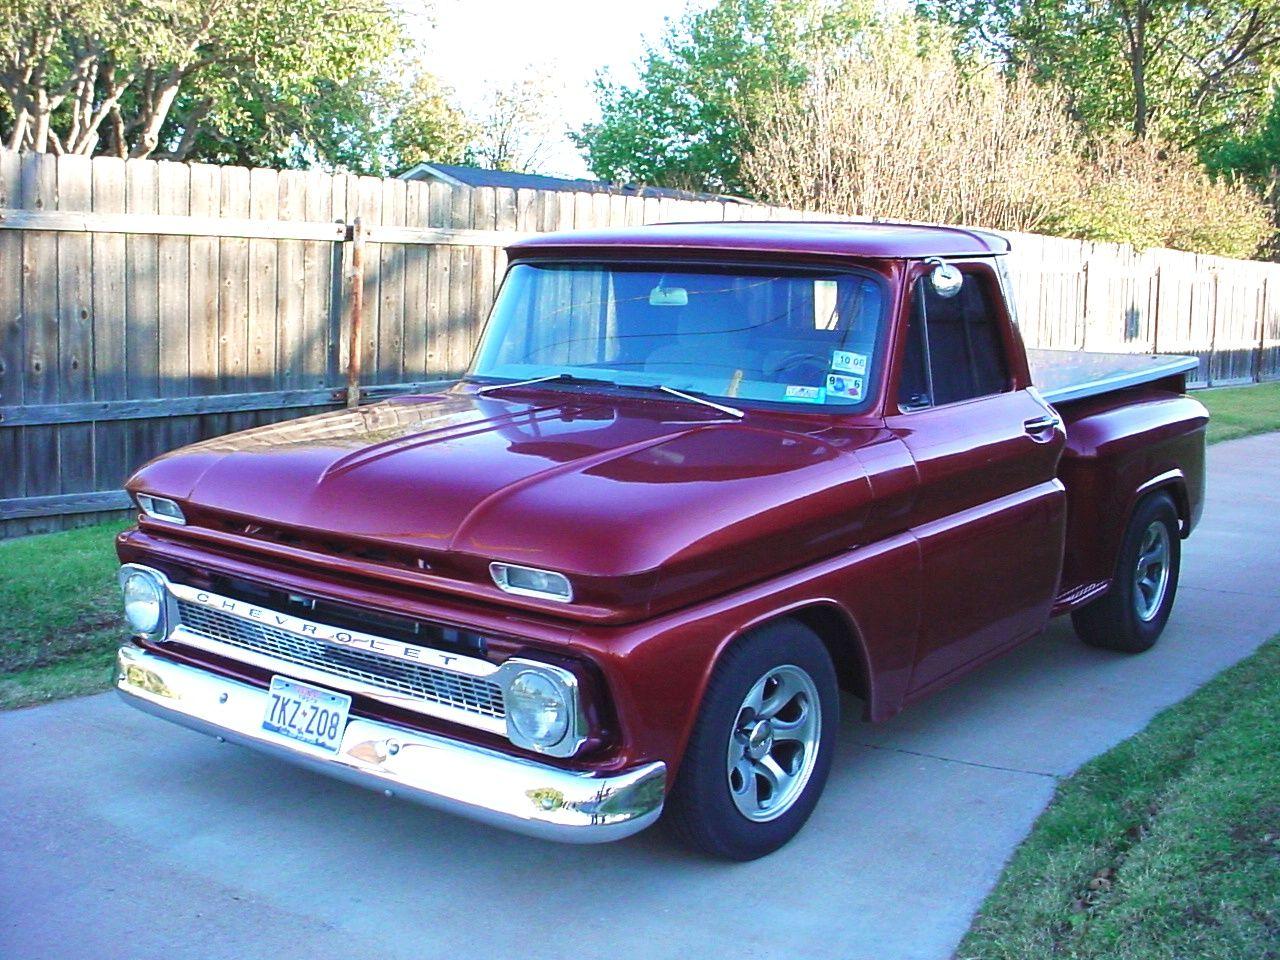 64 Chevy Truck One Day I Will Finish Mine Chevy Trucks Chevy